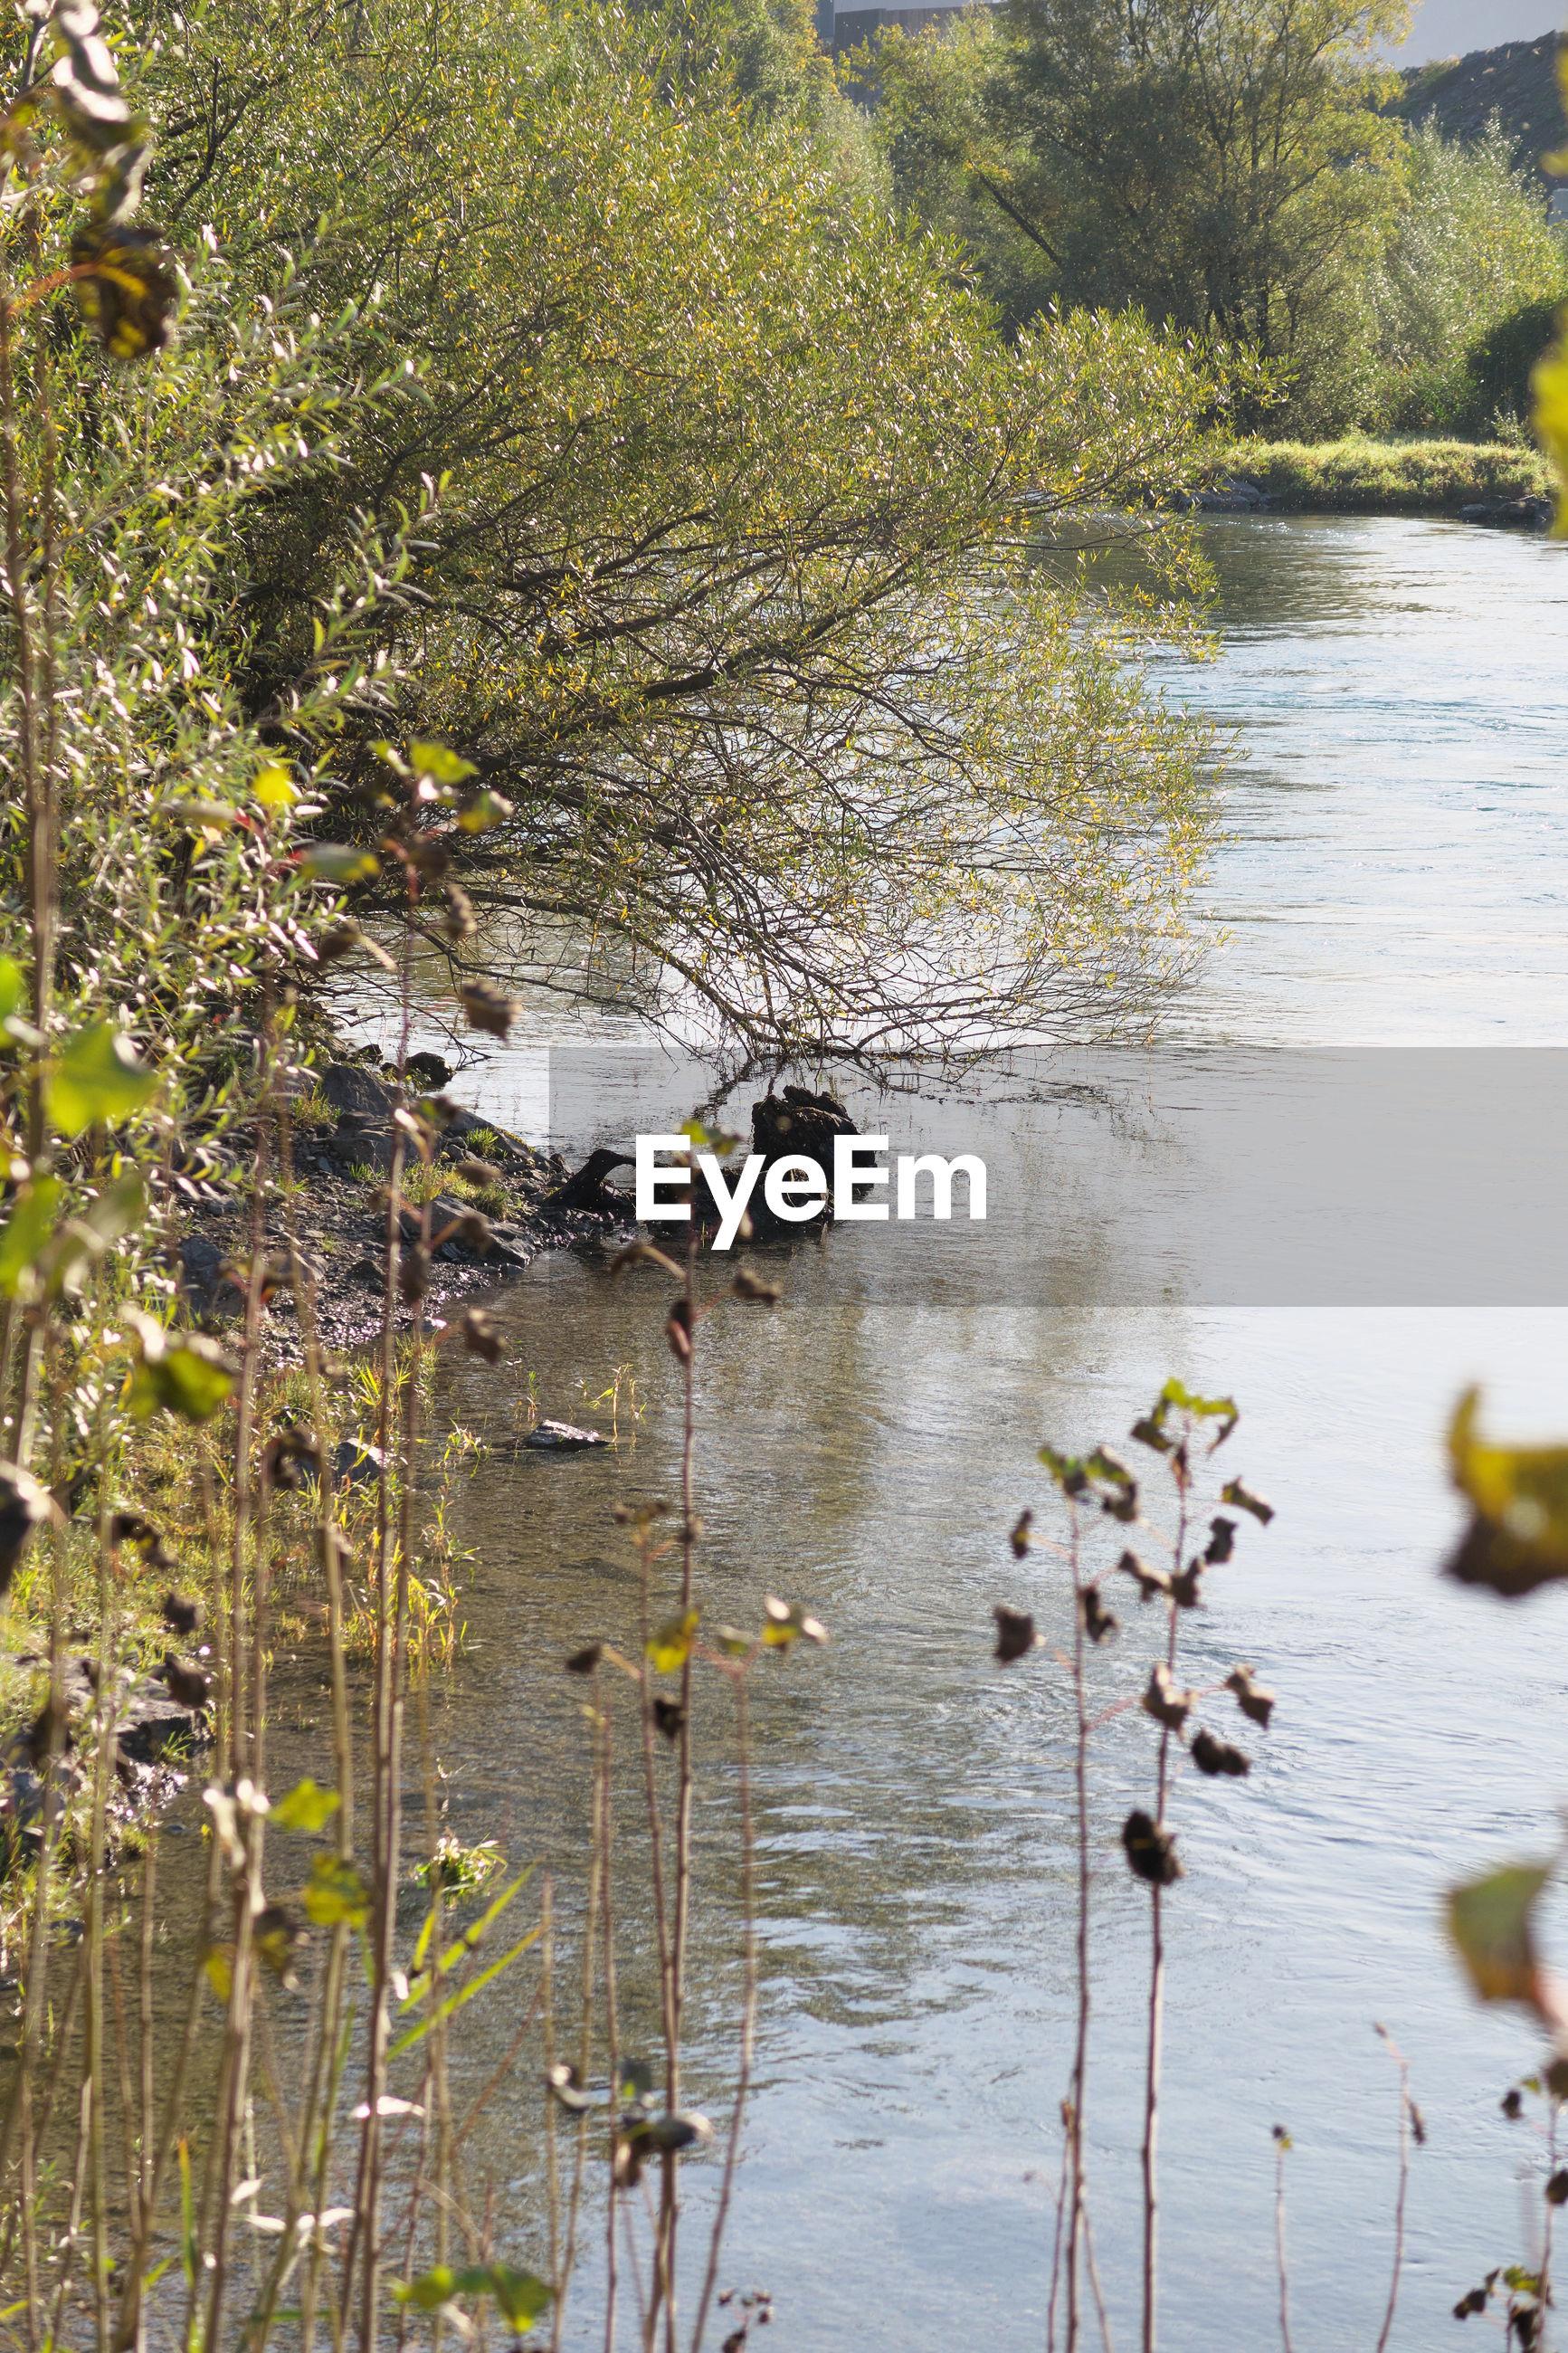 VIEW OF DUCKS ON LAKE